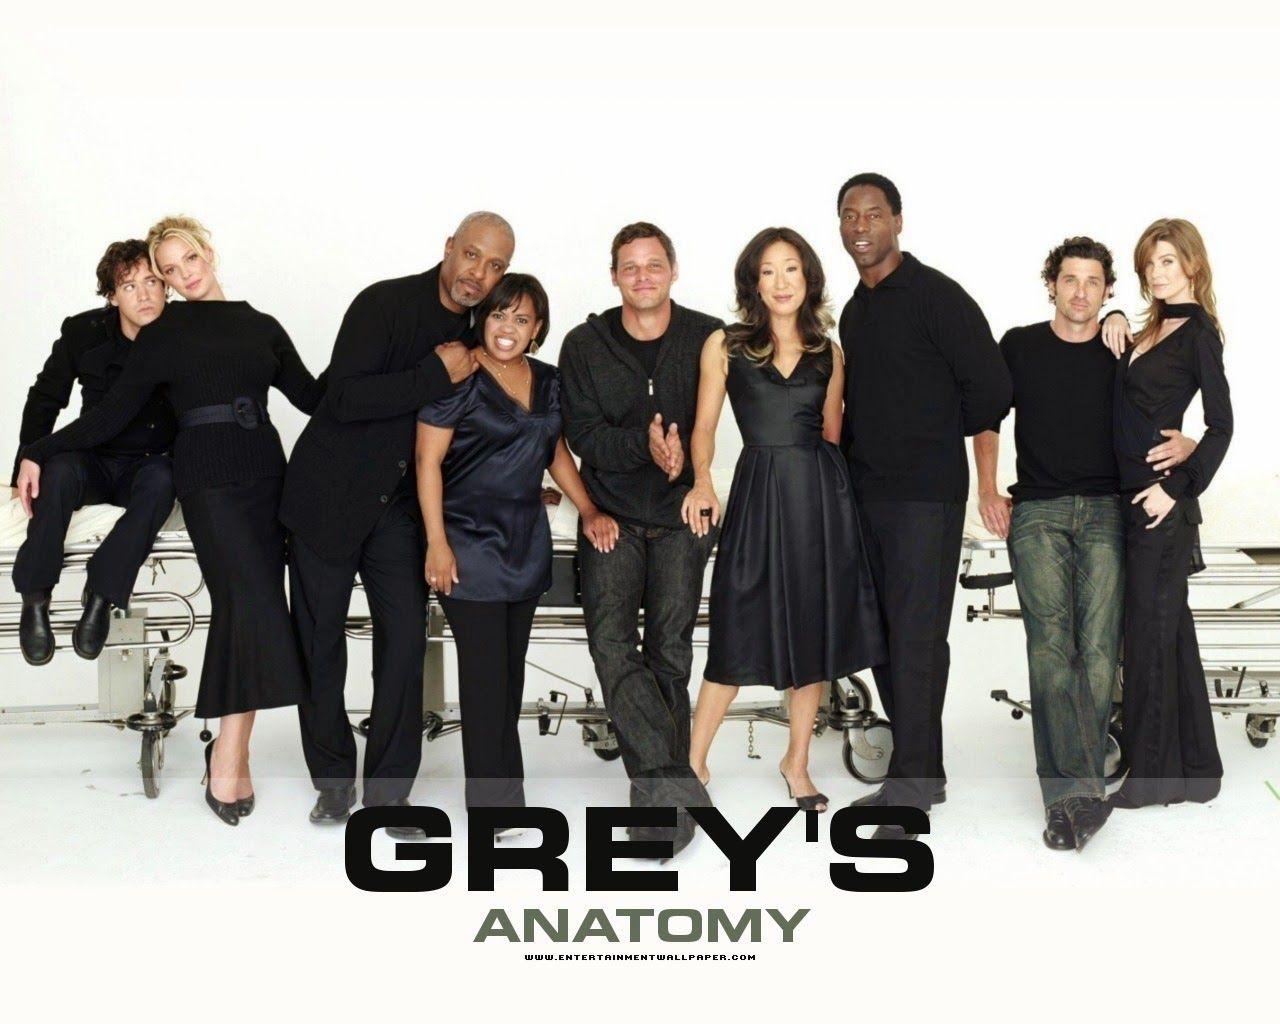 Greys Anatomy S11E21 HDTV x264-LOL[ettv] torrent - Your Ultimate ...